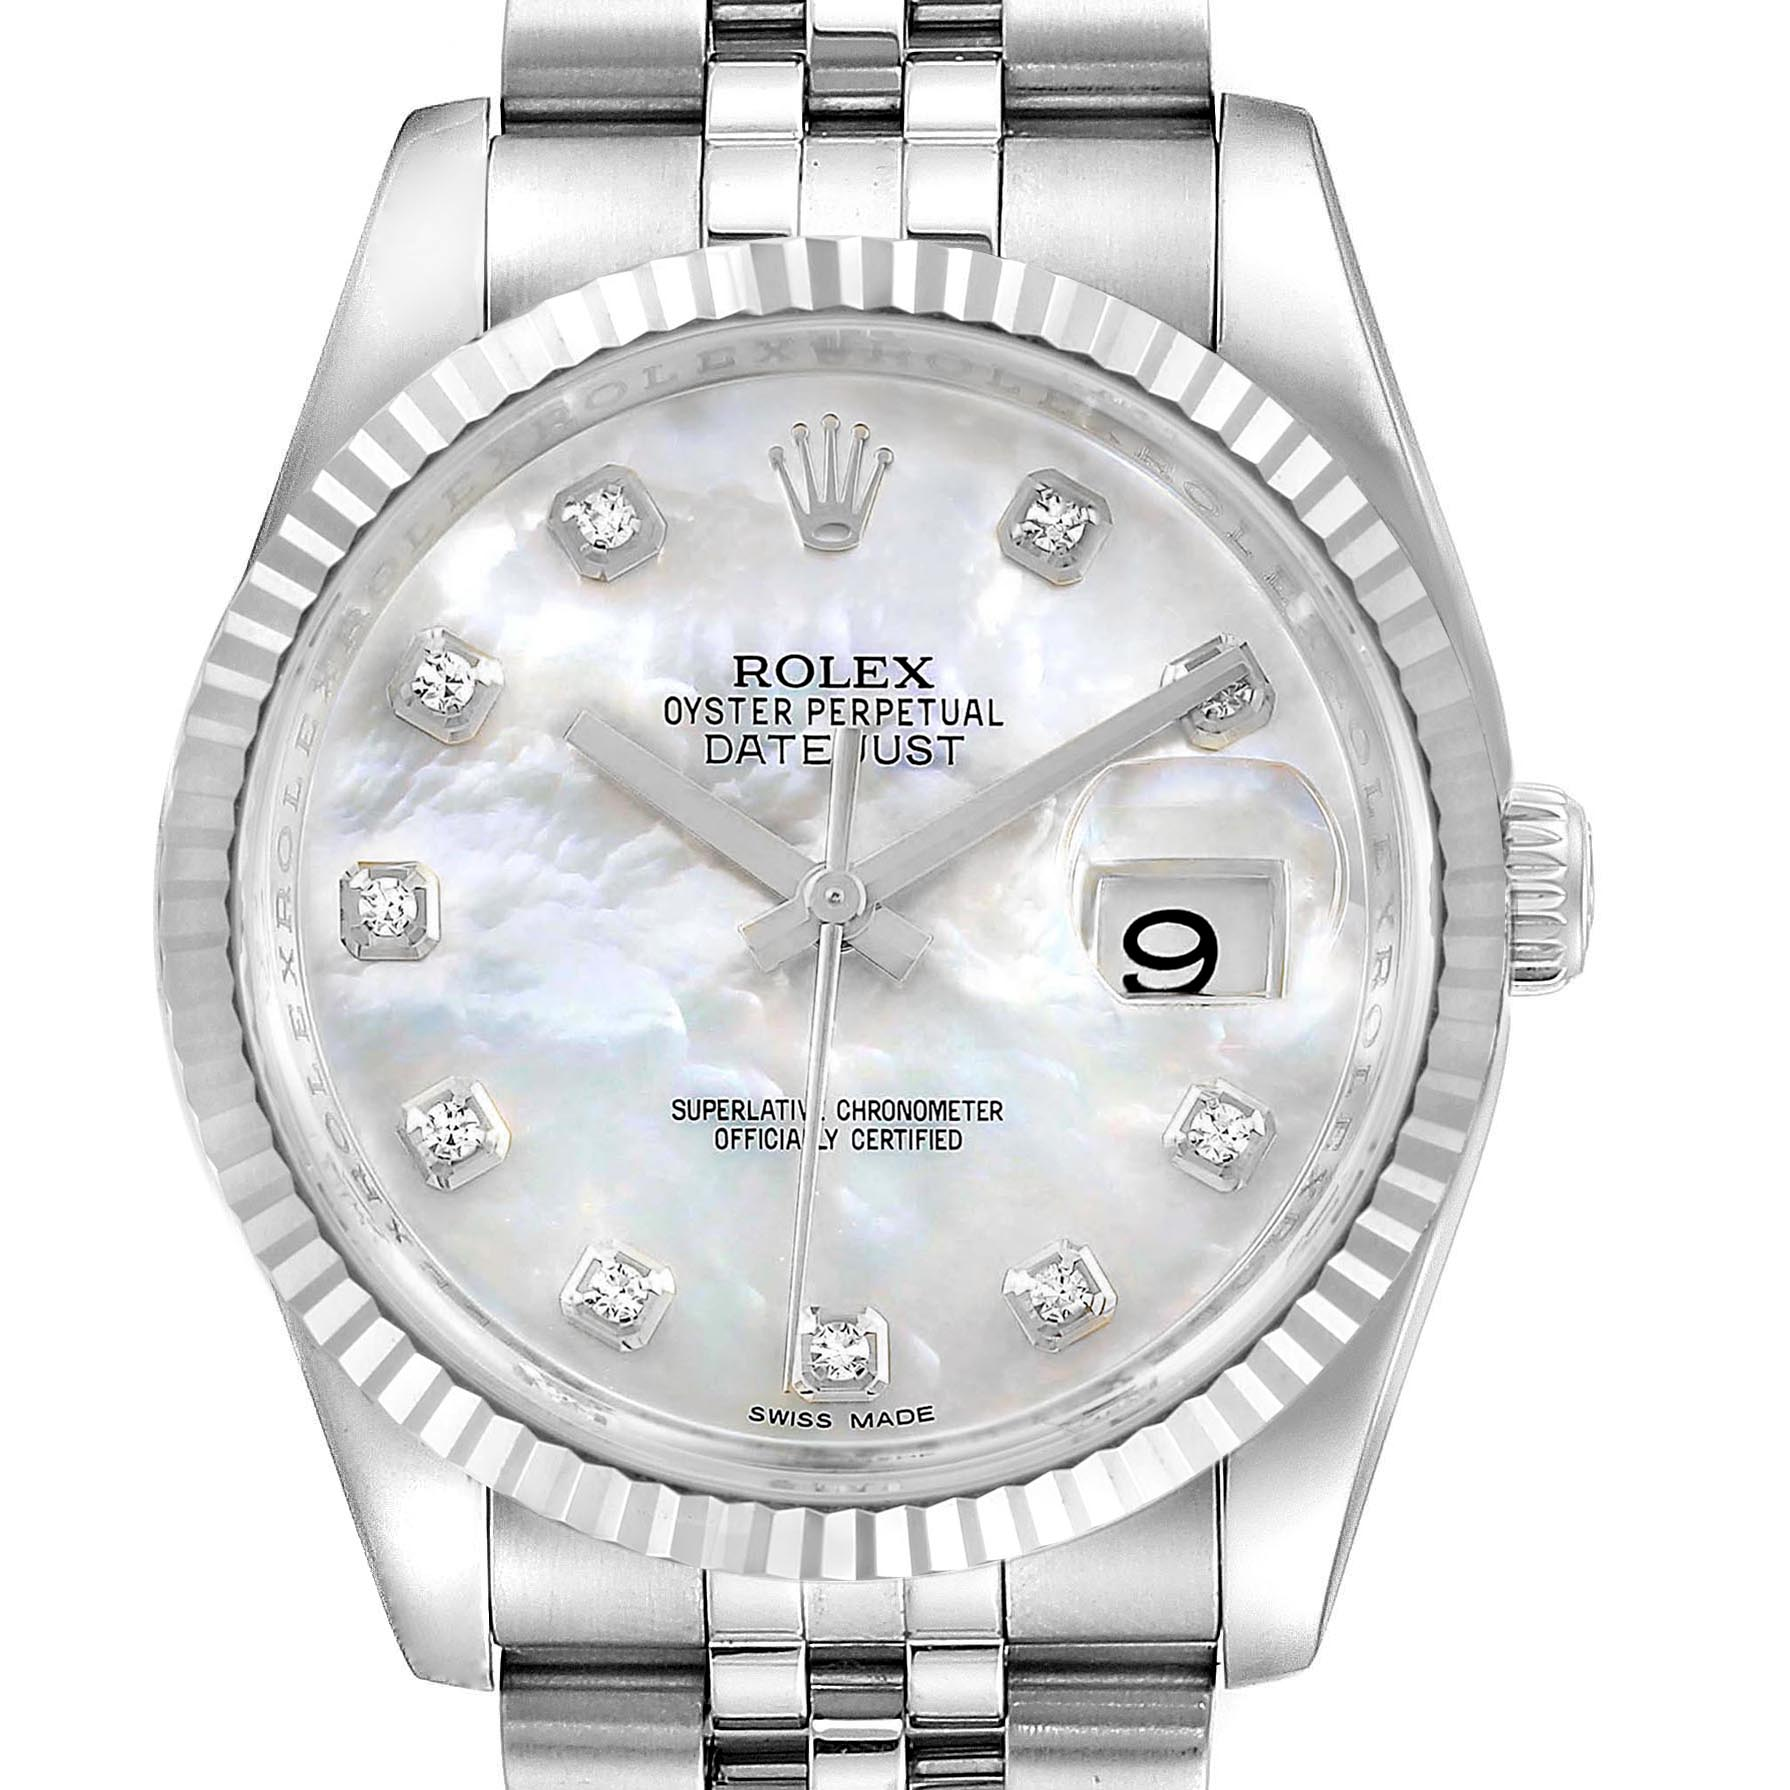 Rolex Datejust Steel White Gold MOP Diamond Dial Mens Watch 116234